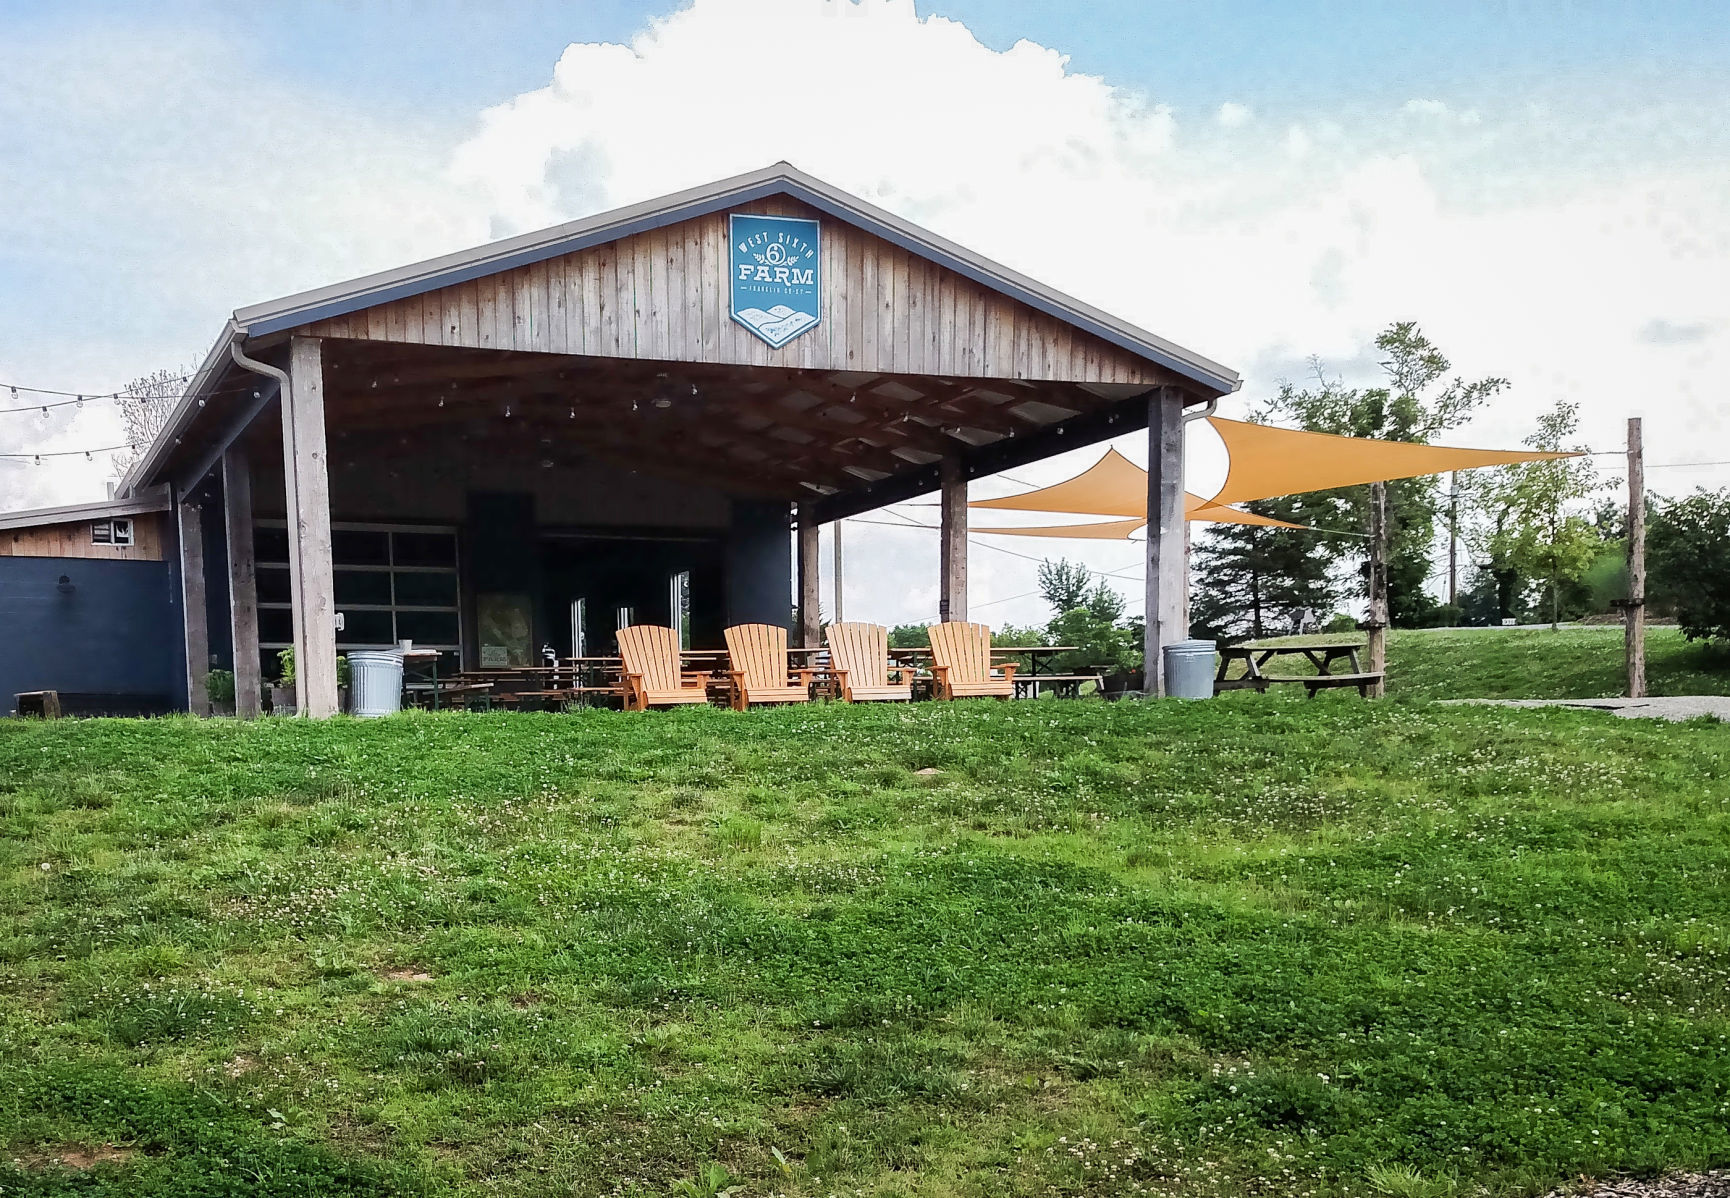 West Sixth Farm to host 61st Farm-City Field Day